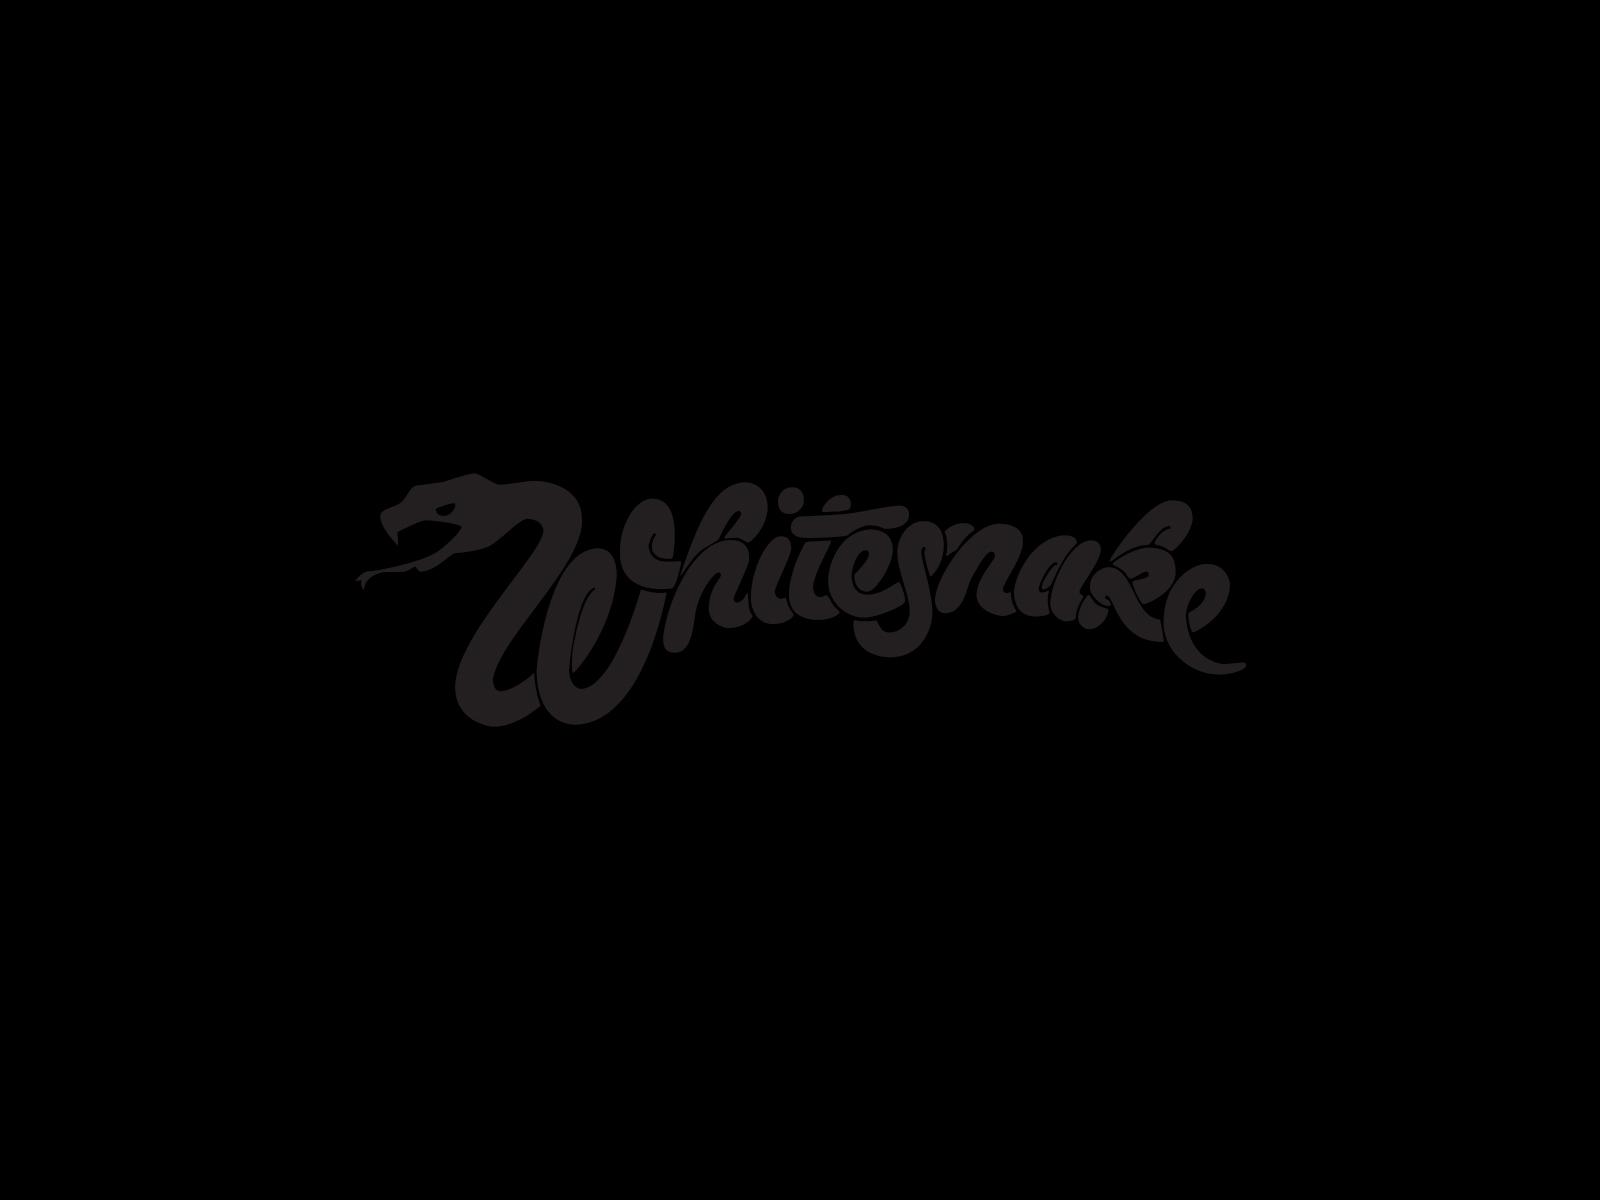 Whitesnake band logo and wallpaper Band logos   Rock 1600x1200